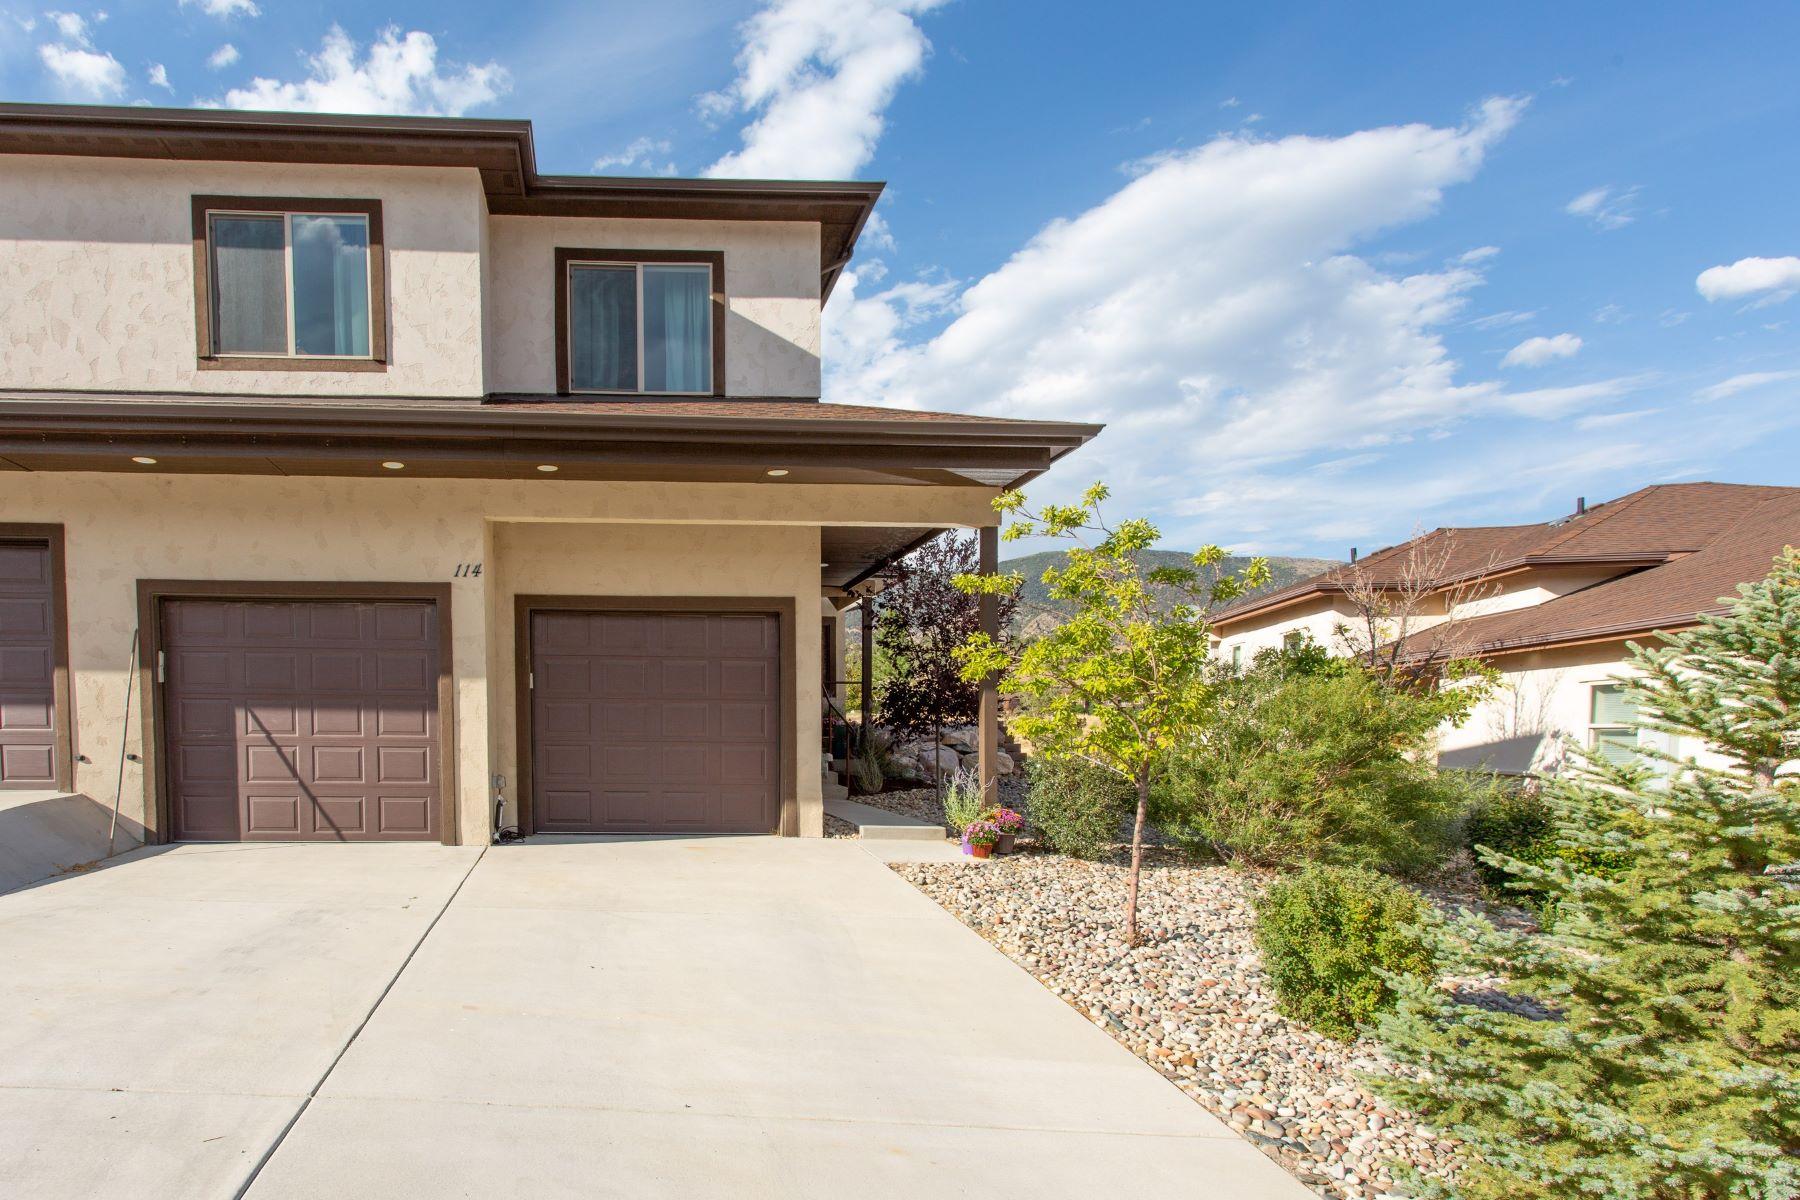 Duplex for Active at Low Maintenance, High-end Home 114 Castle Ridge Drive New Castle, Colorado 81647 United States